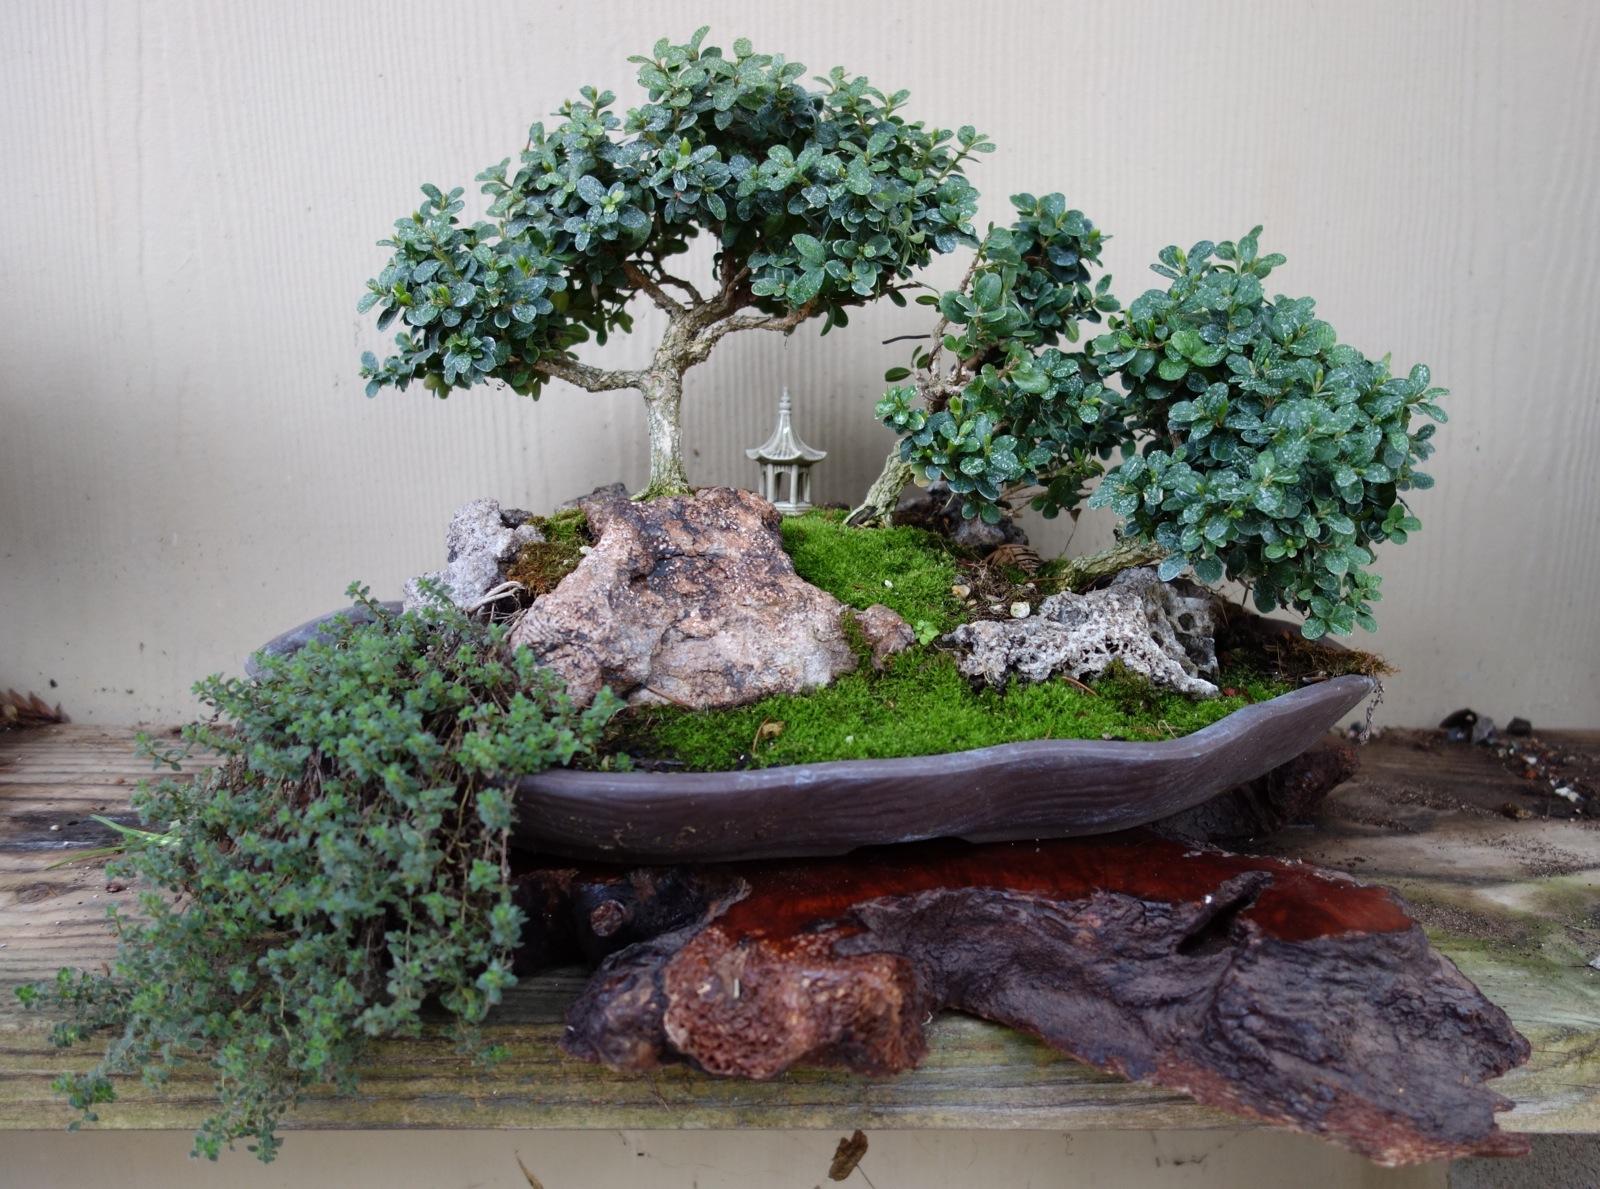 Bonsai gardening tips for the santa cruz mountains